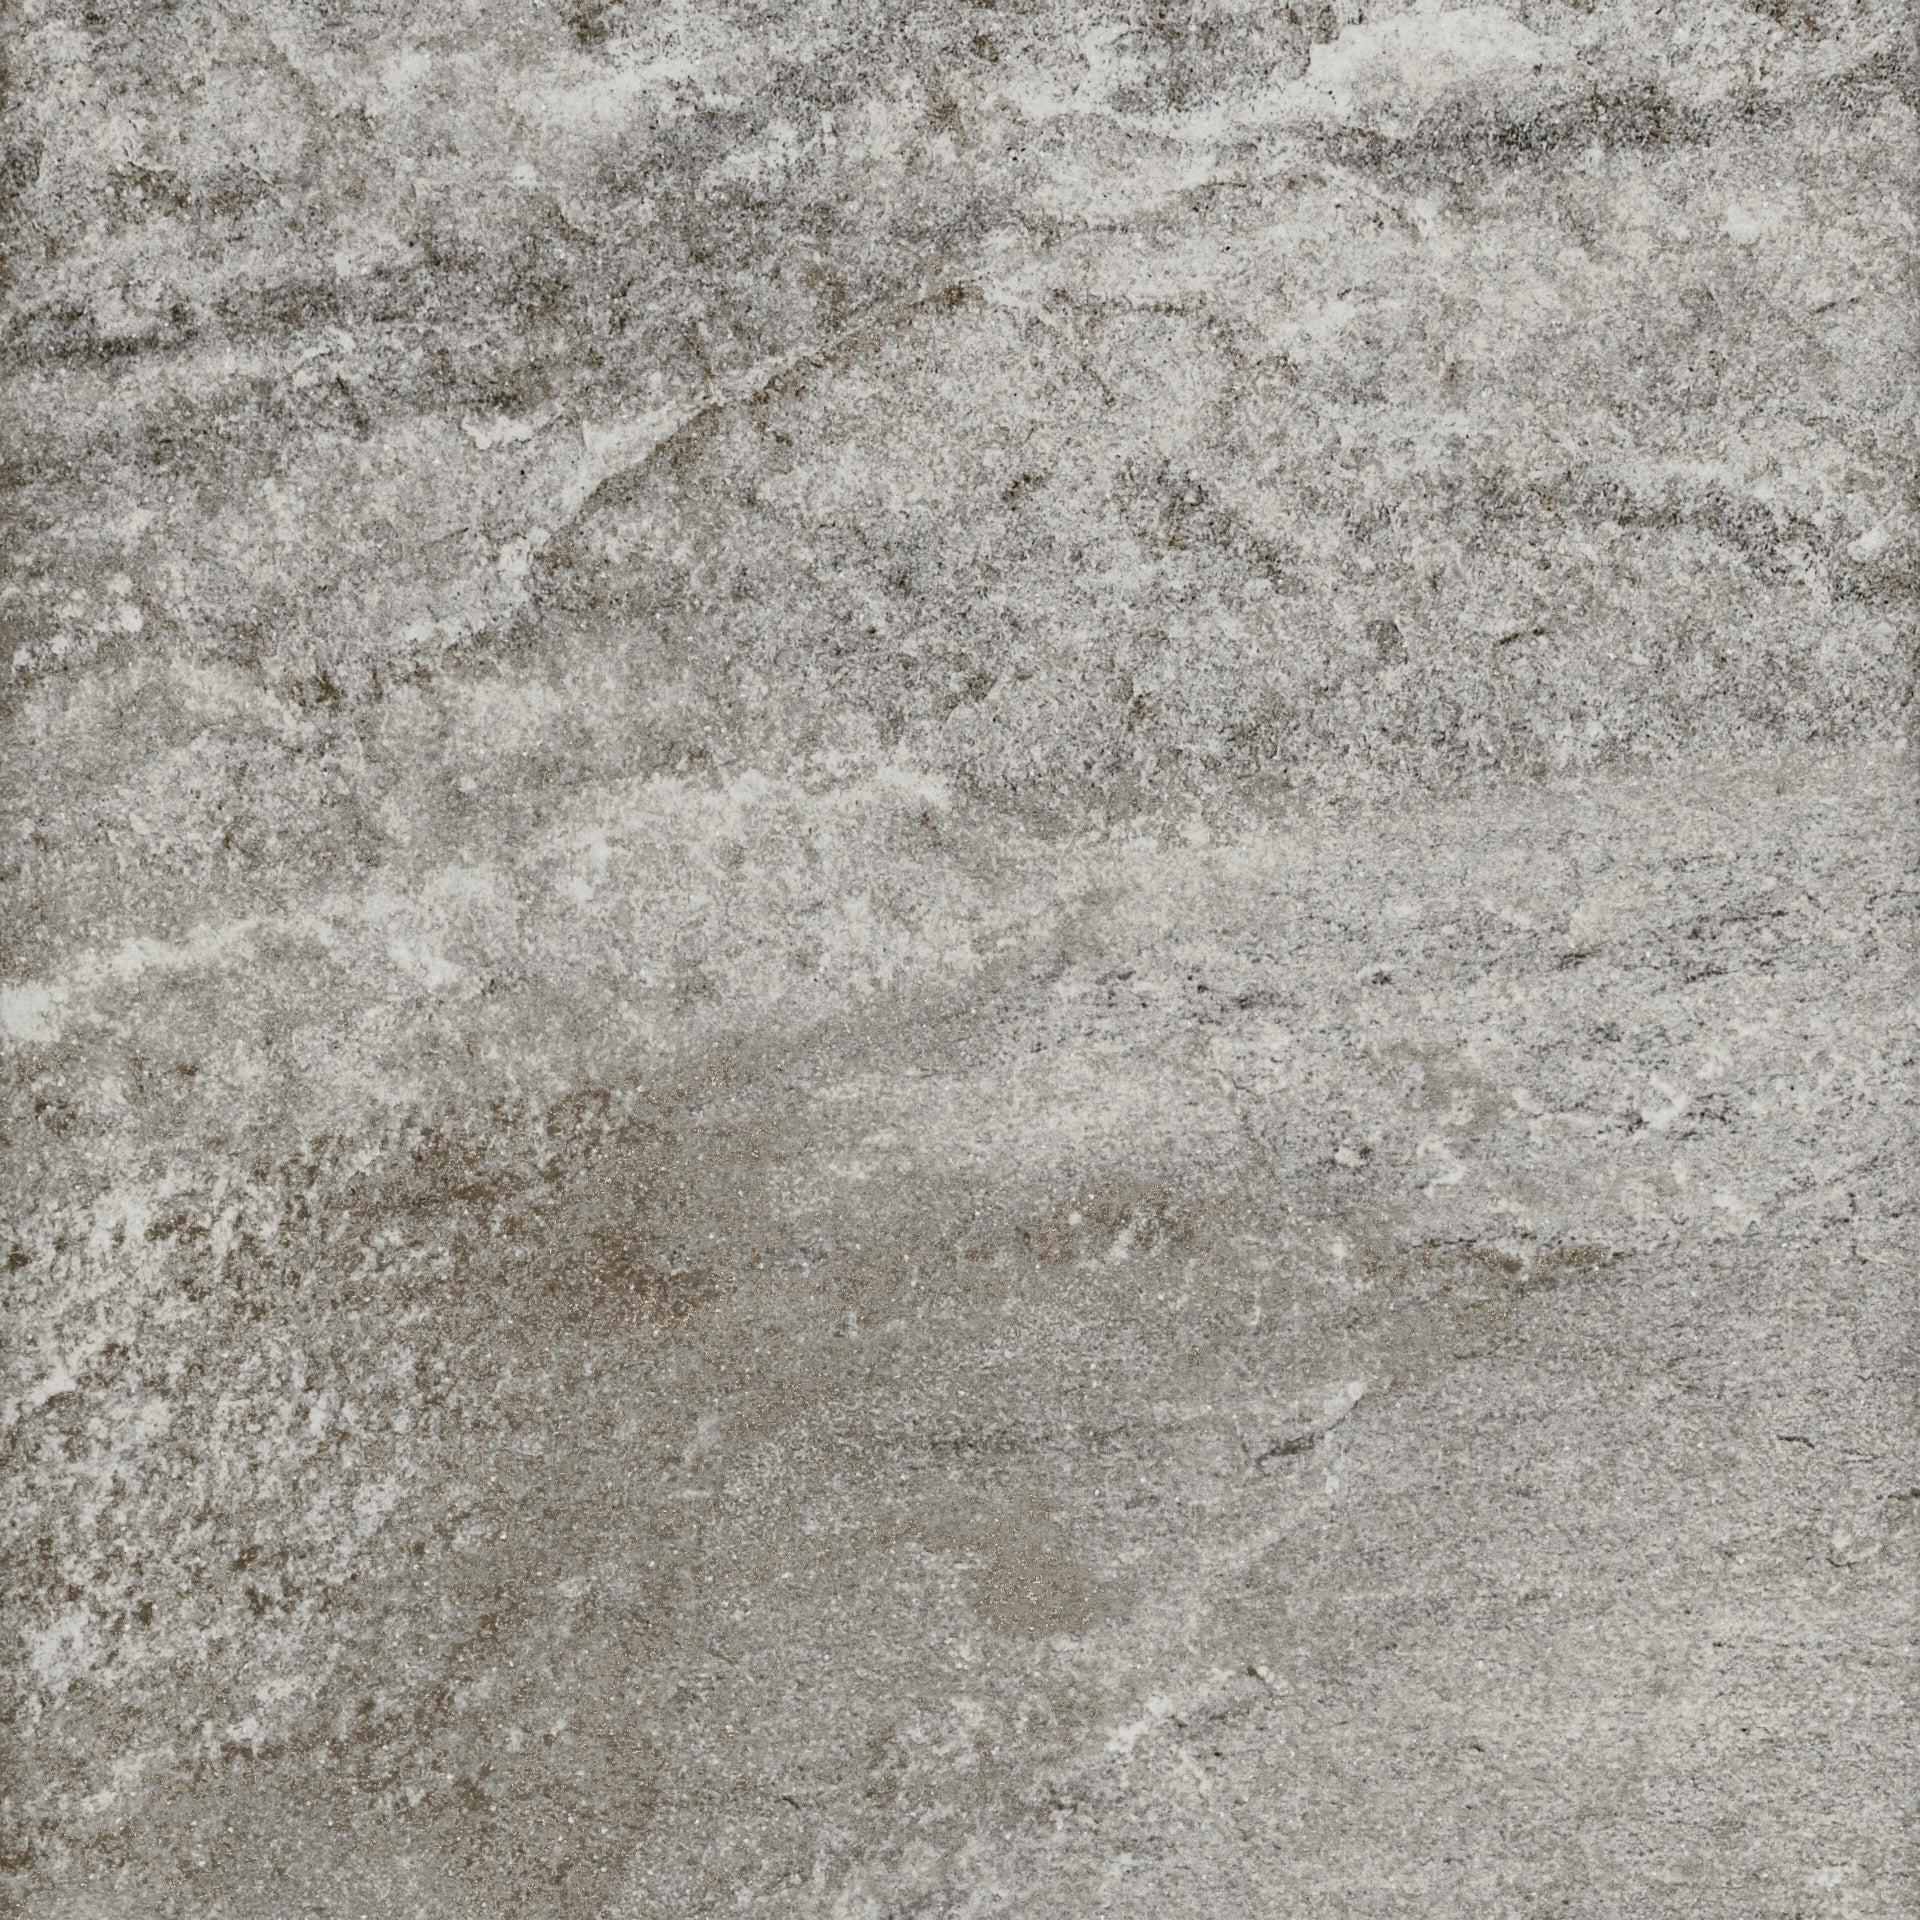 Piastrella da pavimento Walk 32.5 x 32.5 cm sp. 9 mm PEI 3/5 grigio - 3